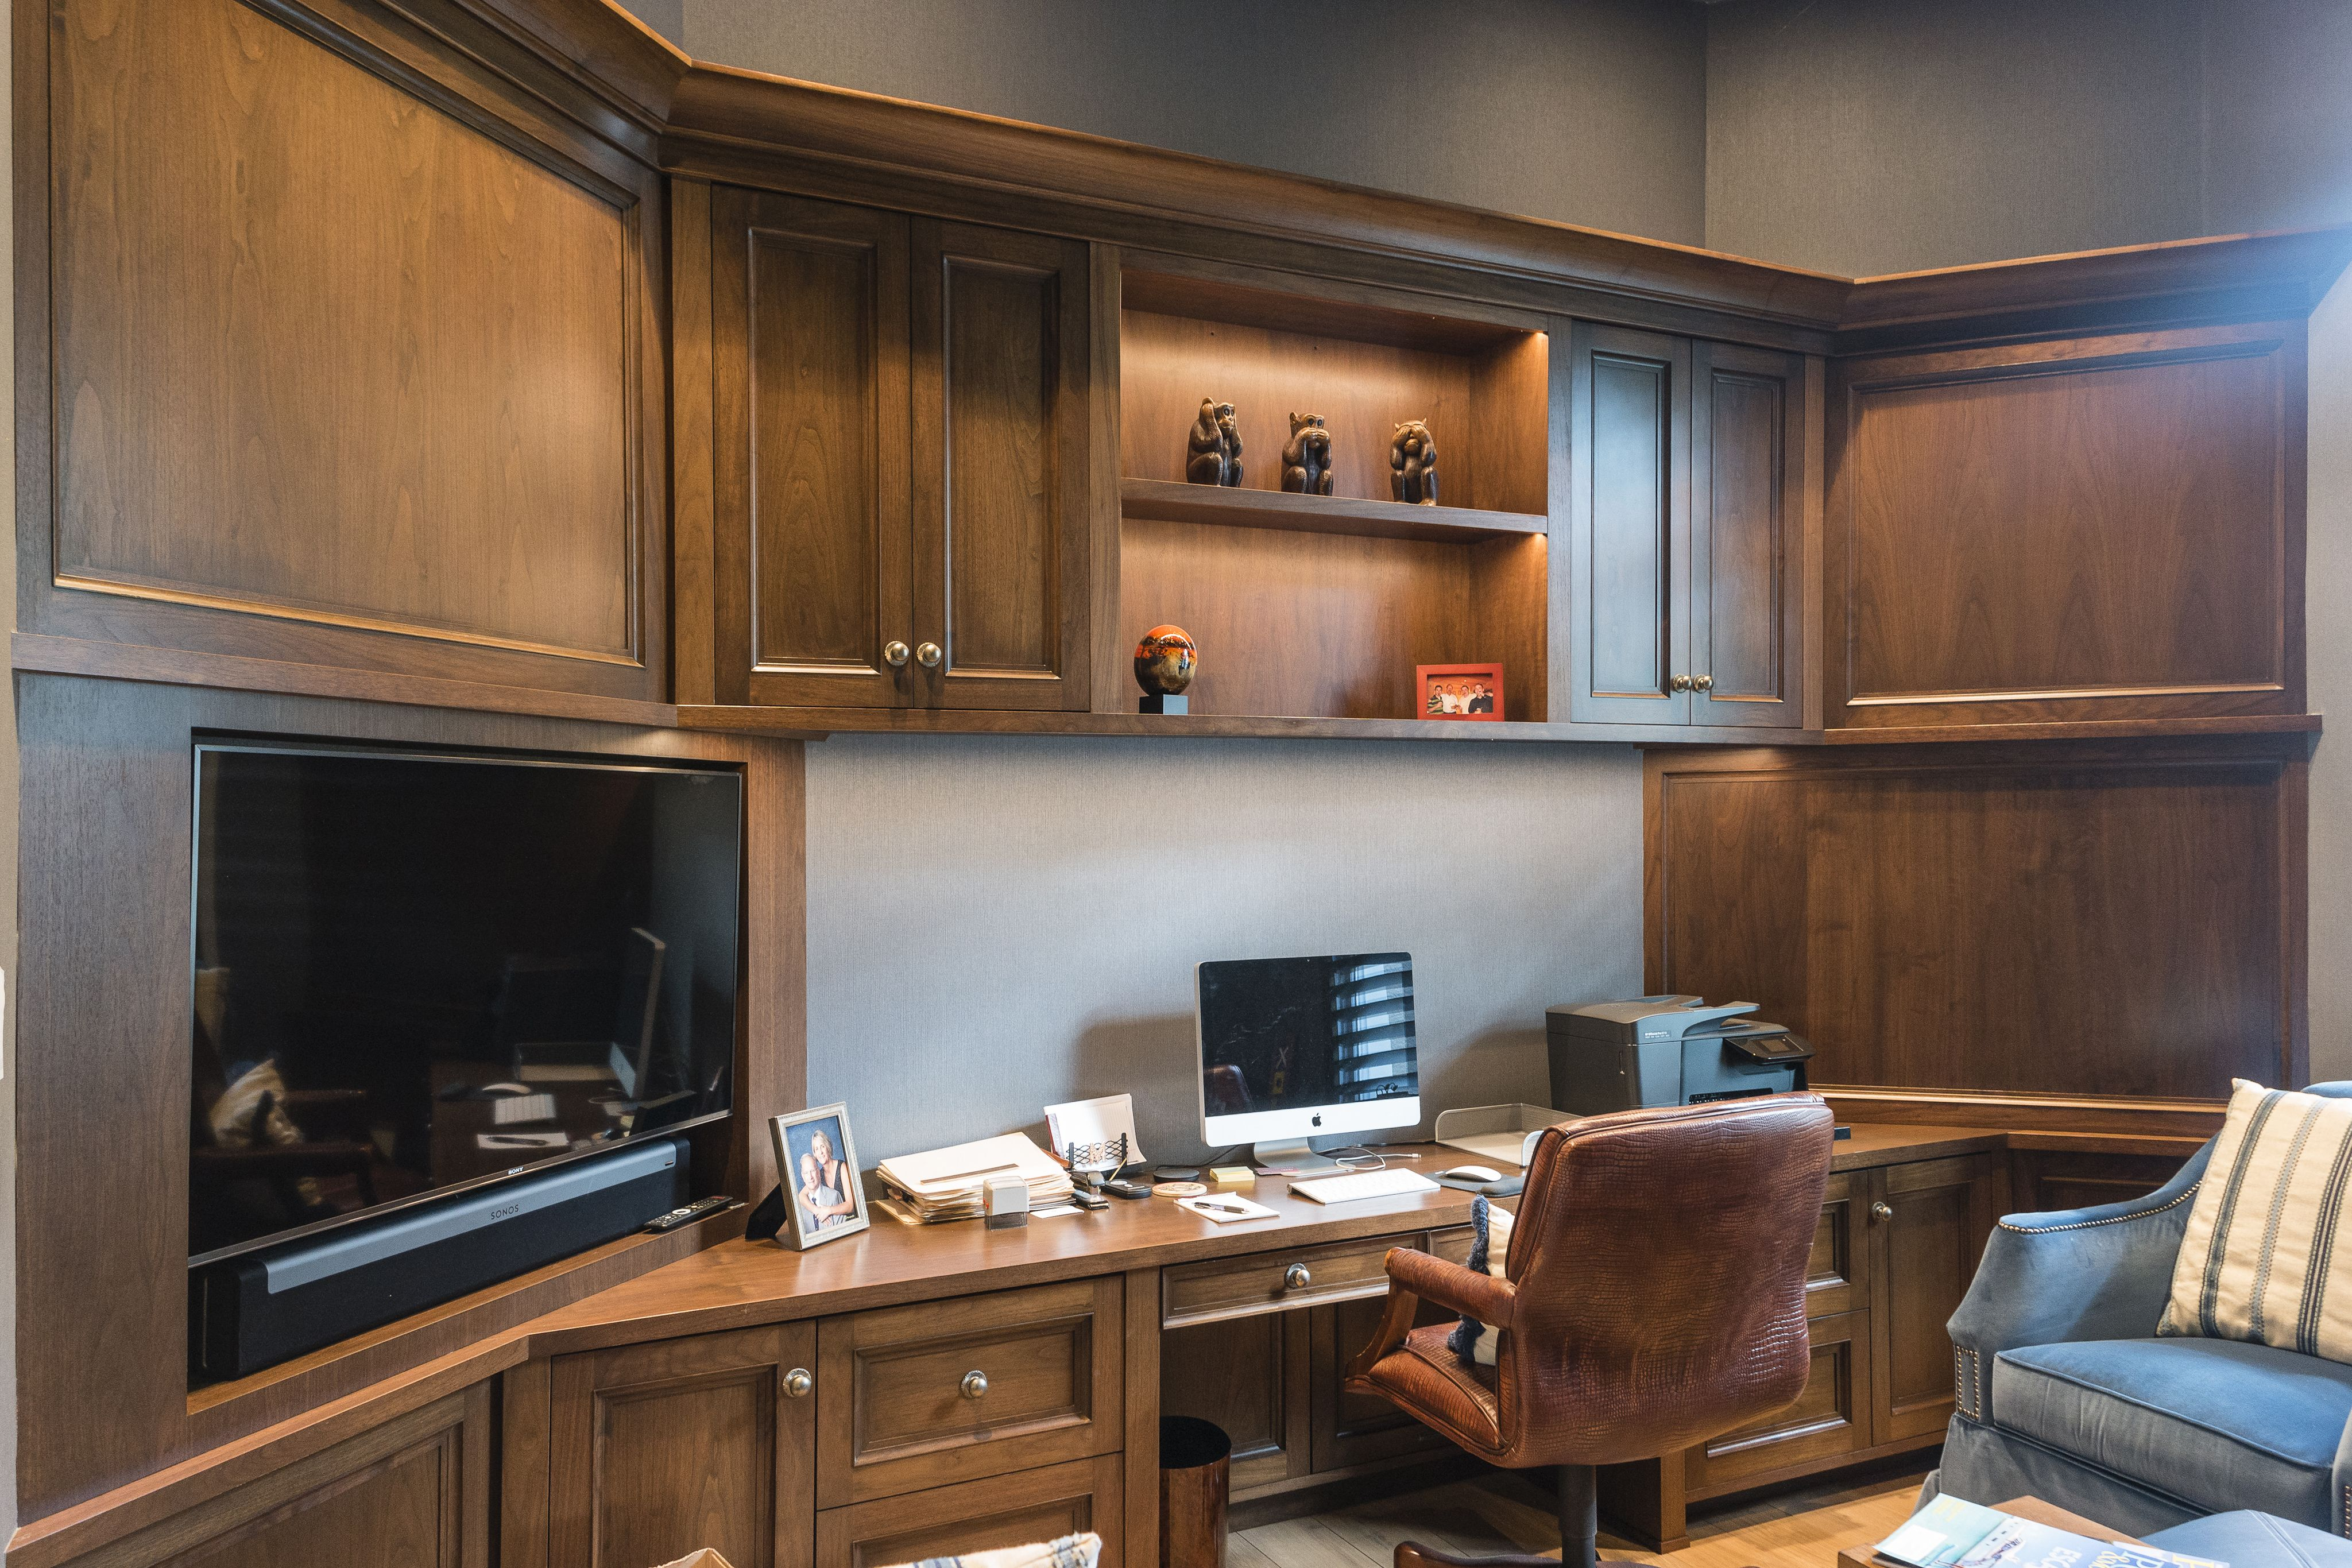 #homeoffice #office #officedecor #officedesign #officefurniture #furniture #custom #naplesinteriordesign #instadecor #interiordecorator #interiordesignlovers #naplesflorida #floridainteriors #floridainteriordesign #floridainteriordesigner #interiordesigngoals #interiordesignerlife